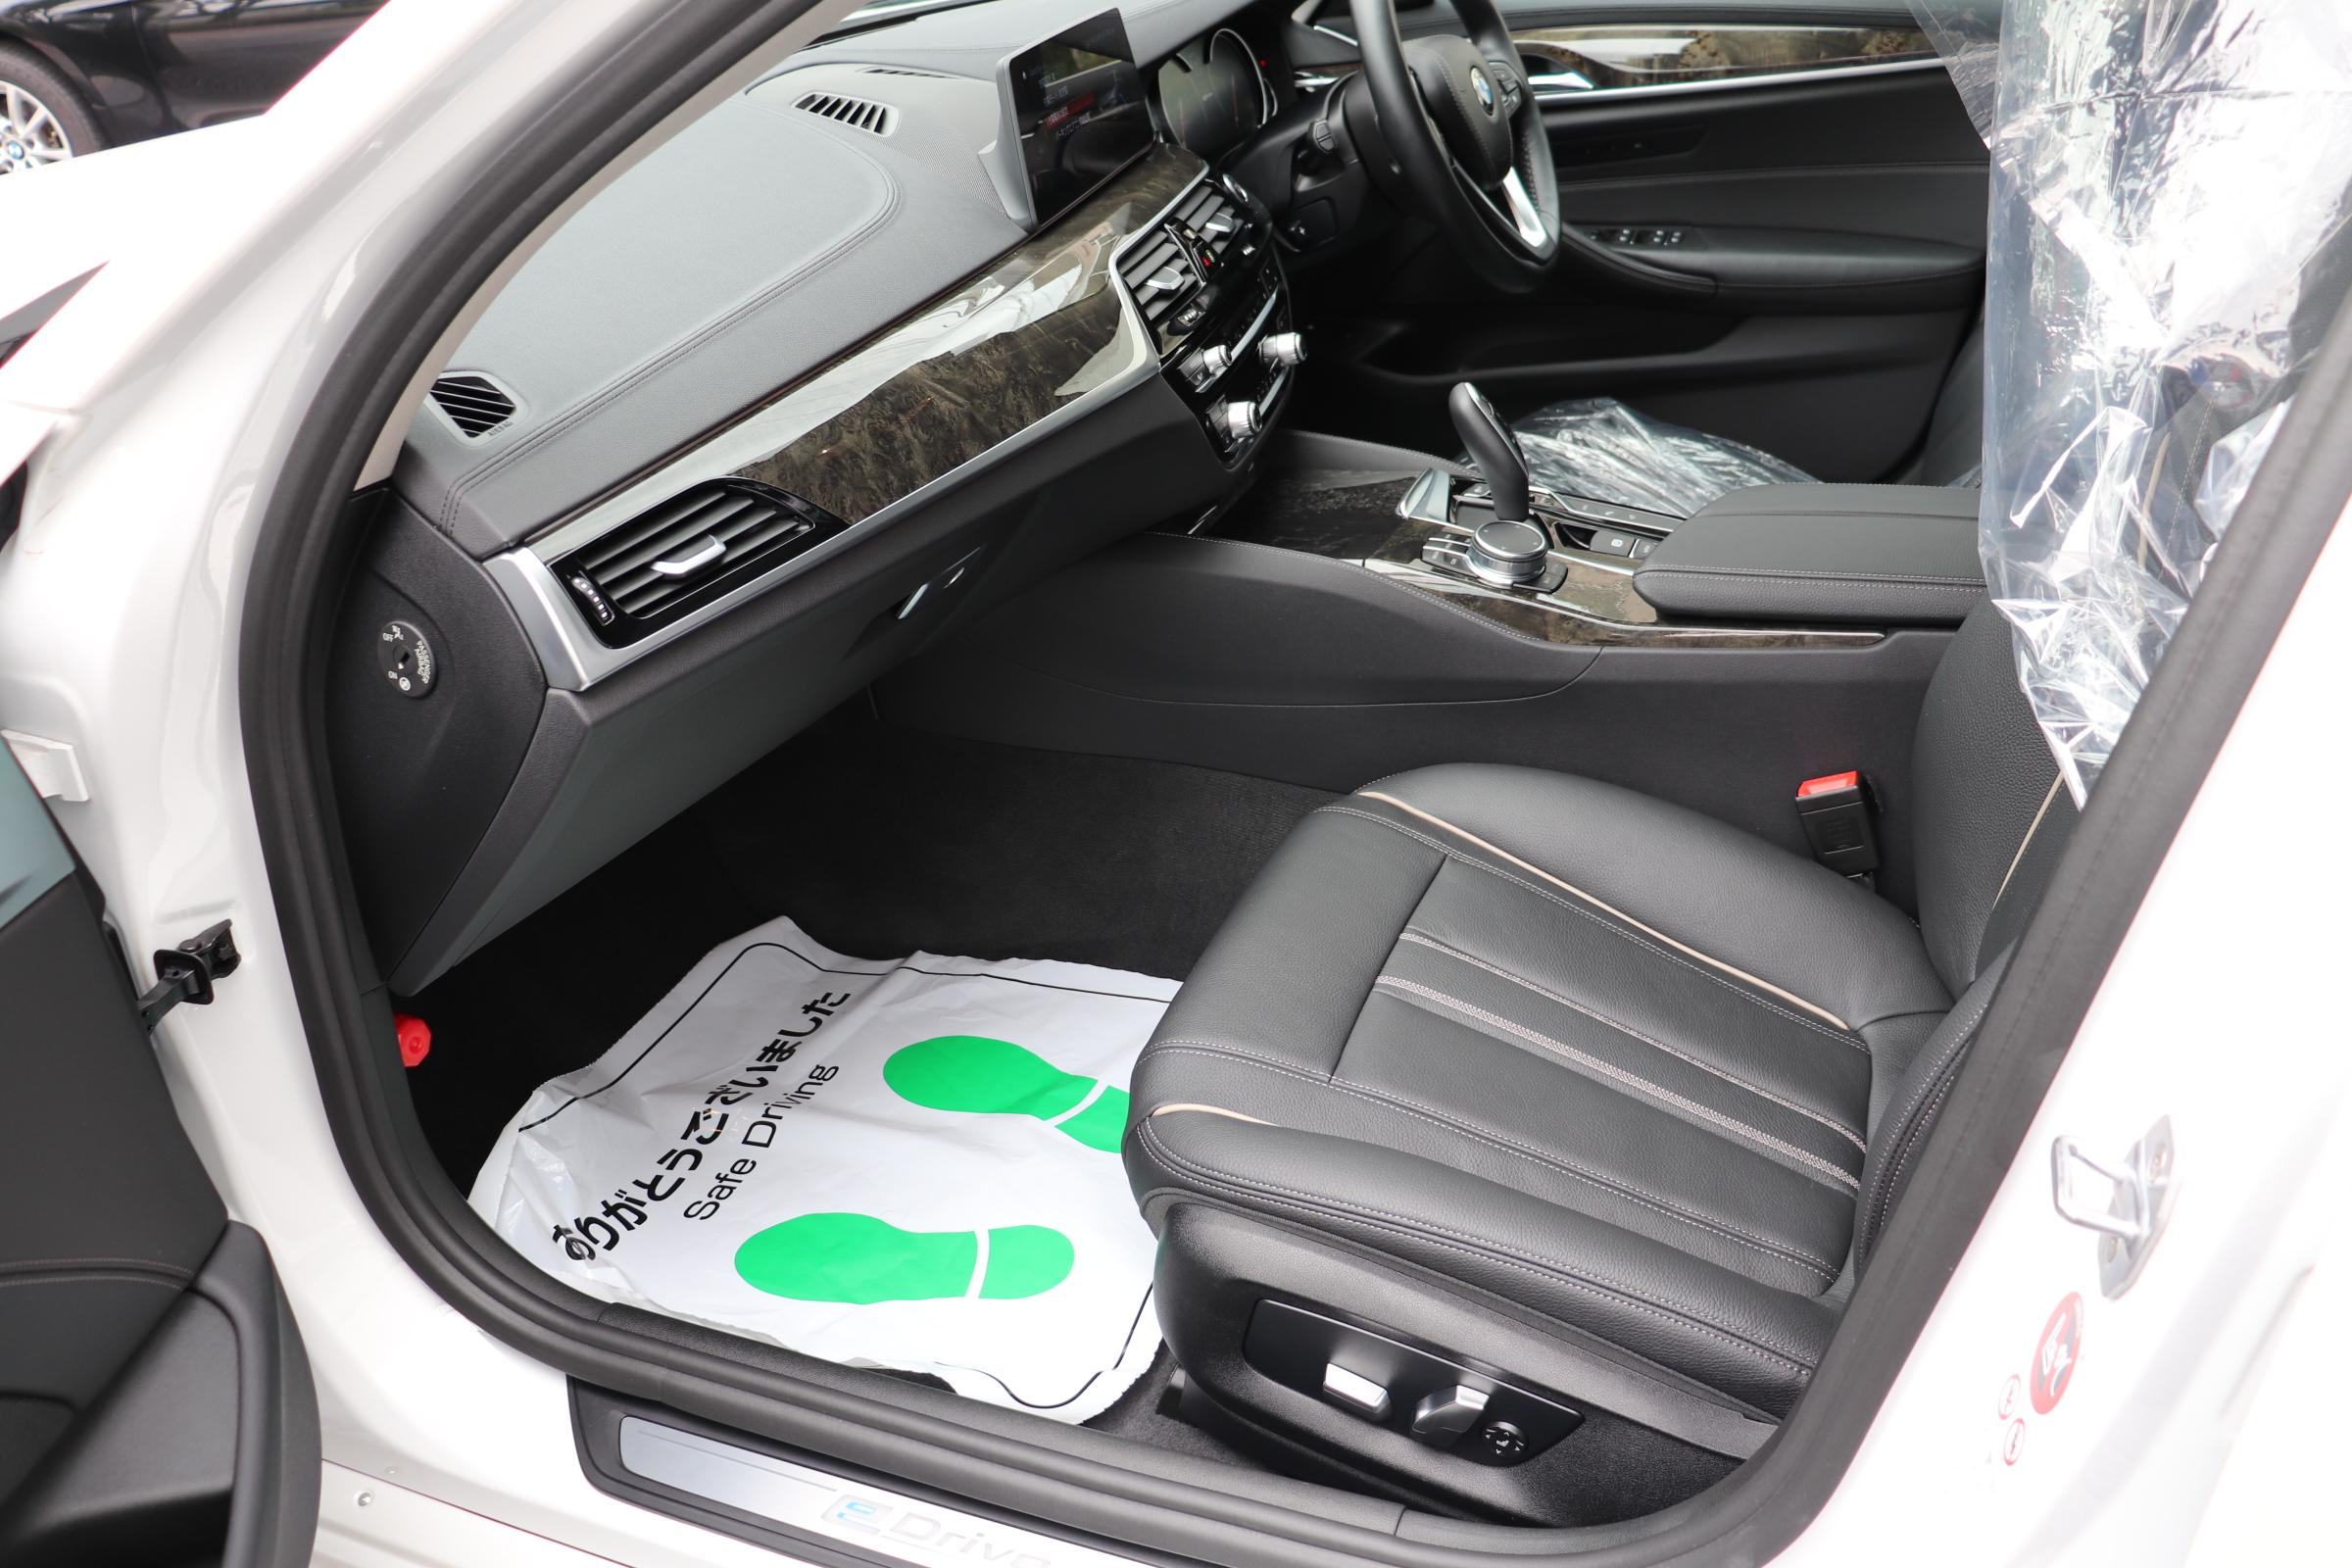 530e iパフォーマンス ラグジュアリー BEAMコンプリートカー車両画像13